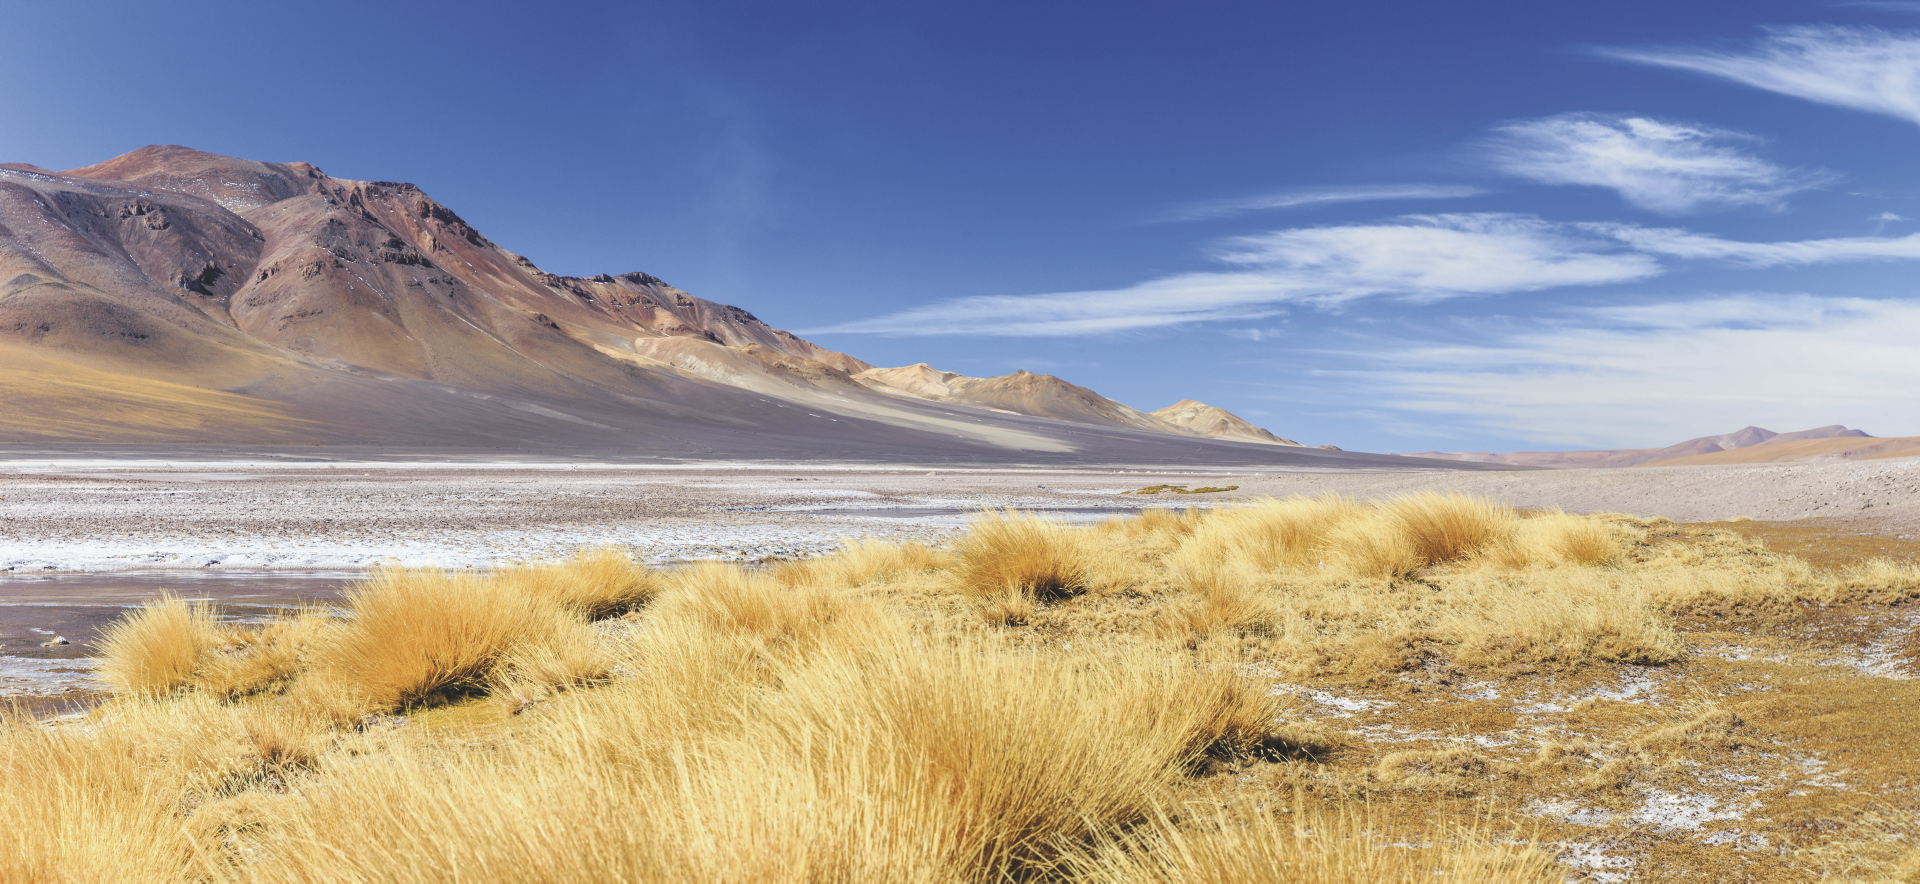 Salar de Huasco in Nordchile